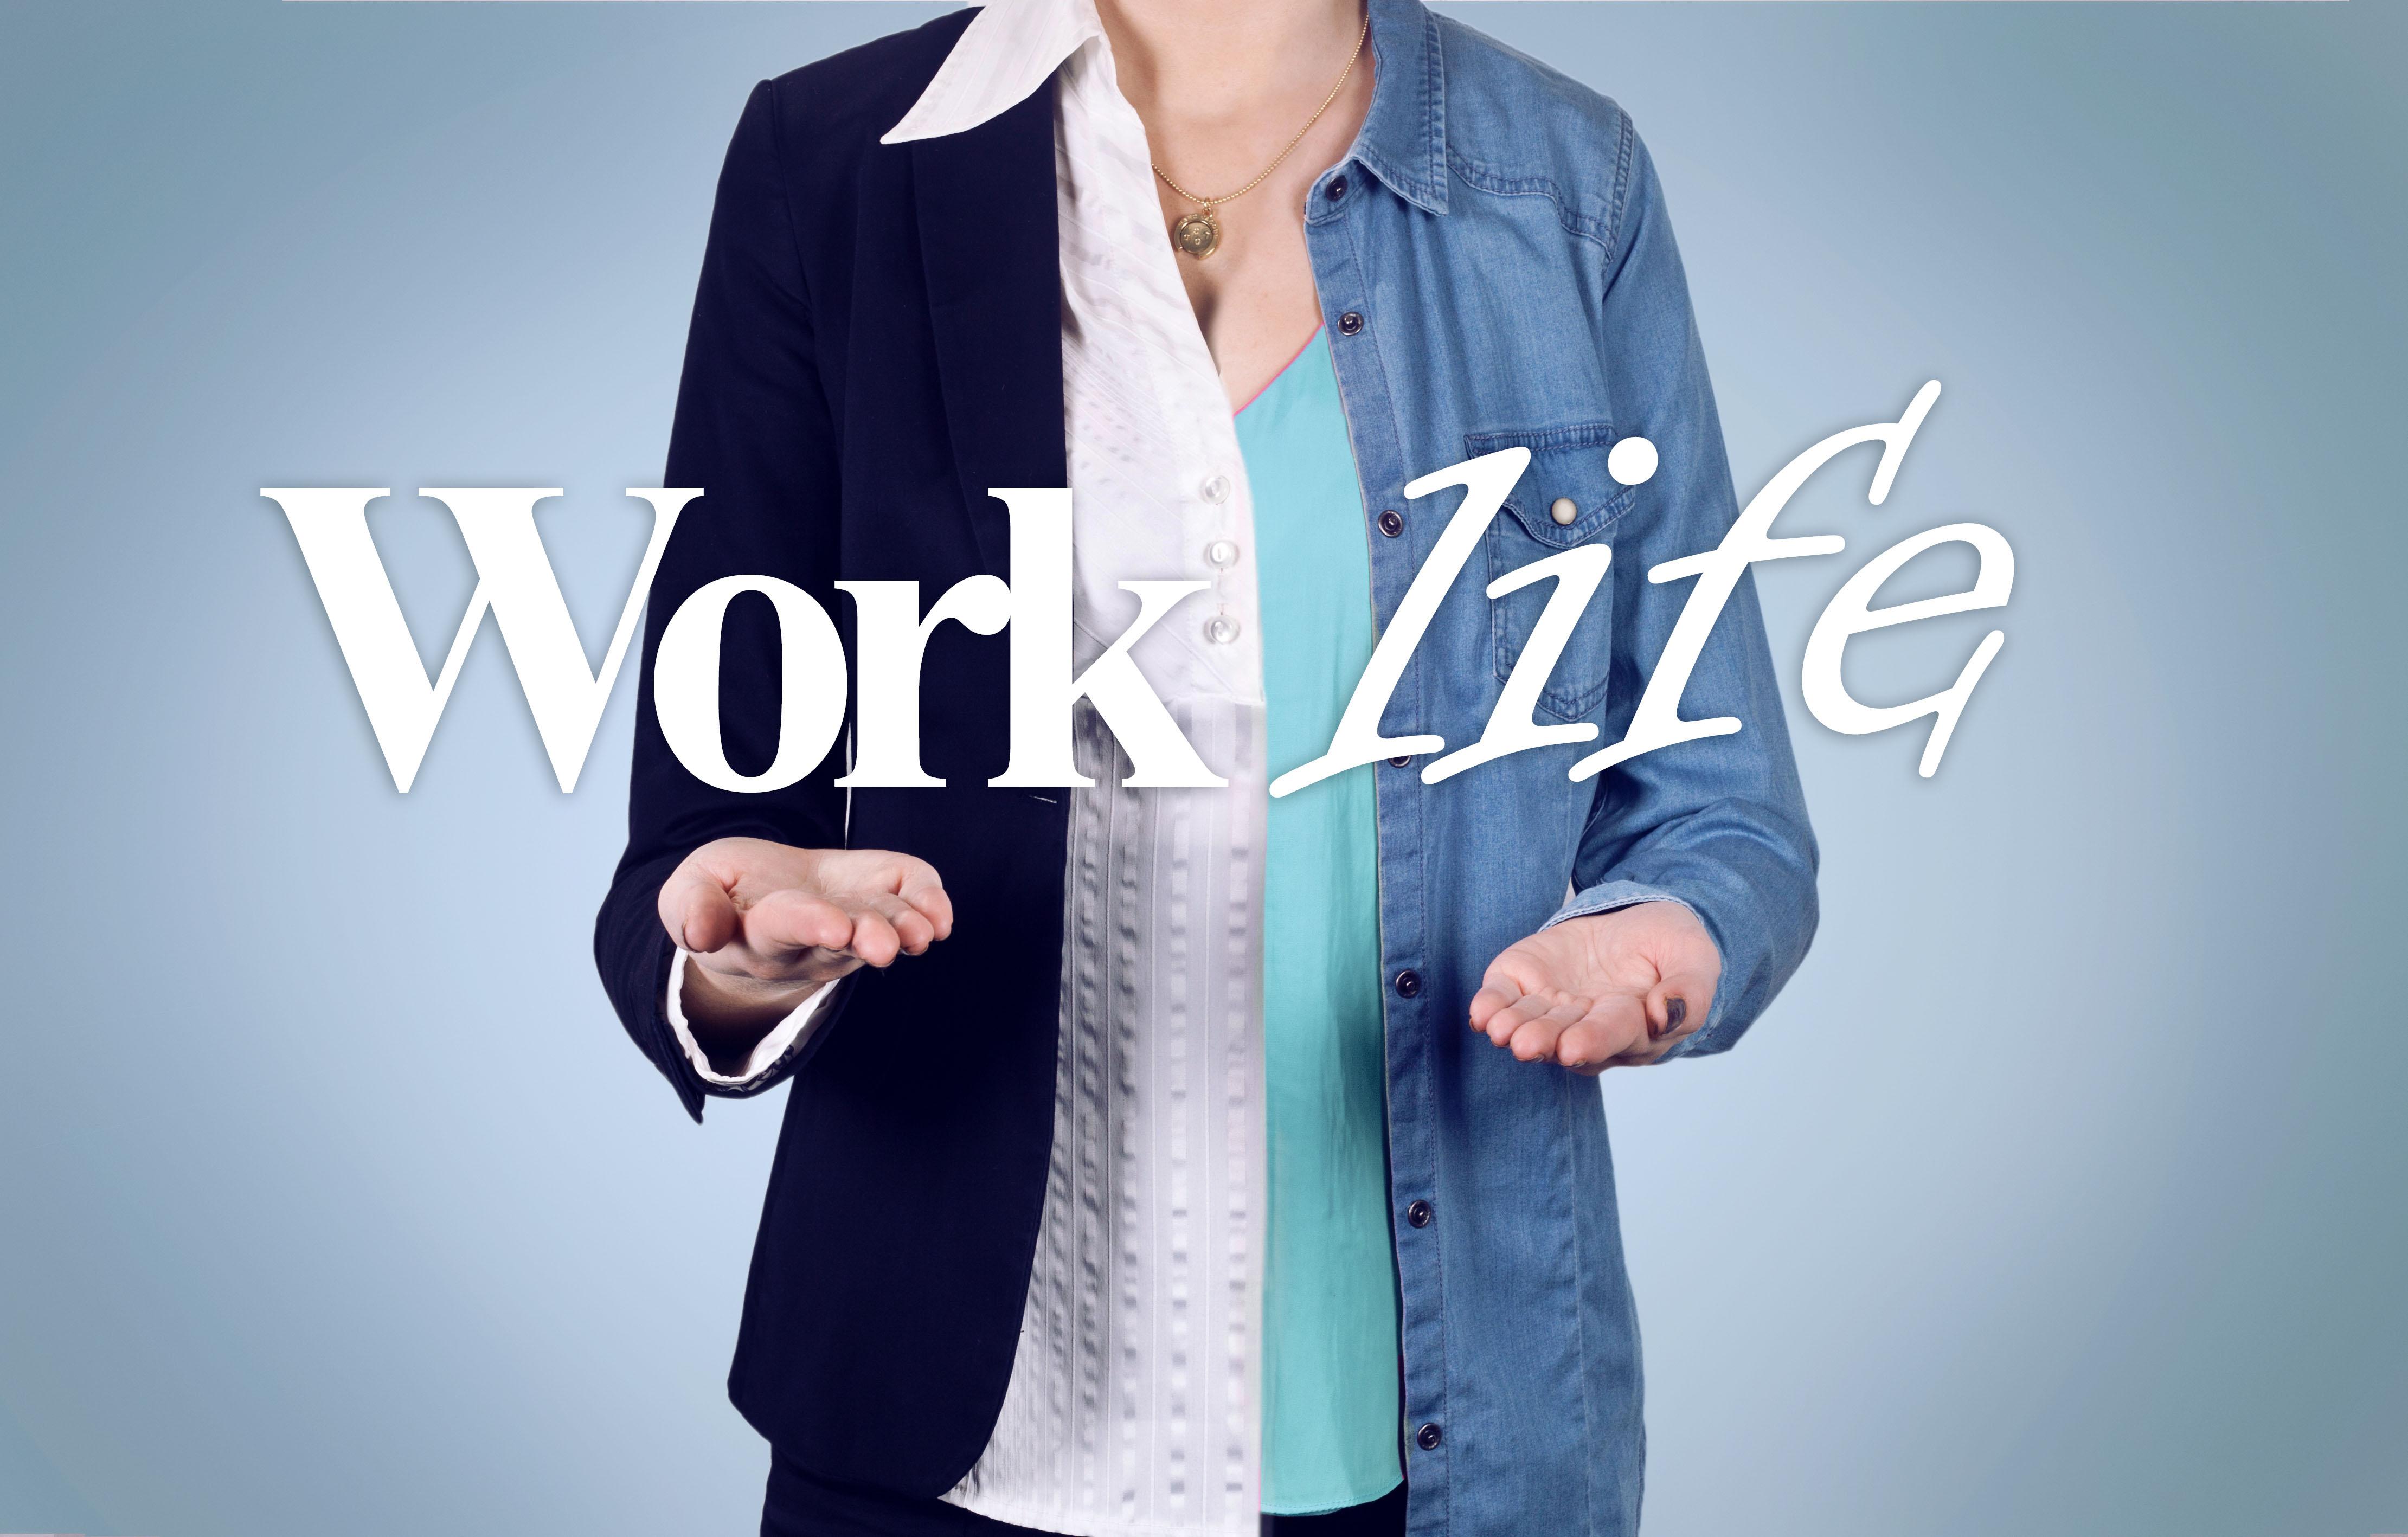 Work_life_balance.jpg